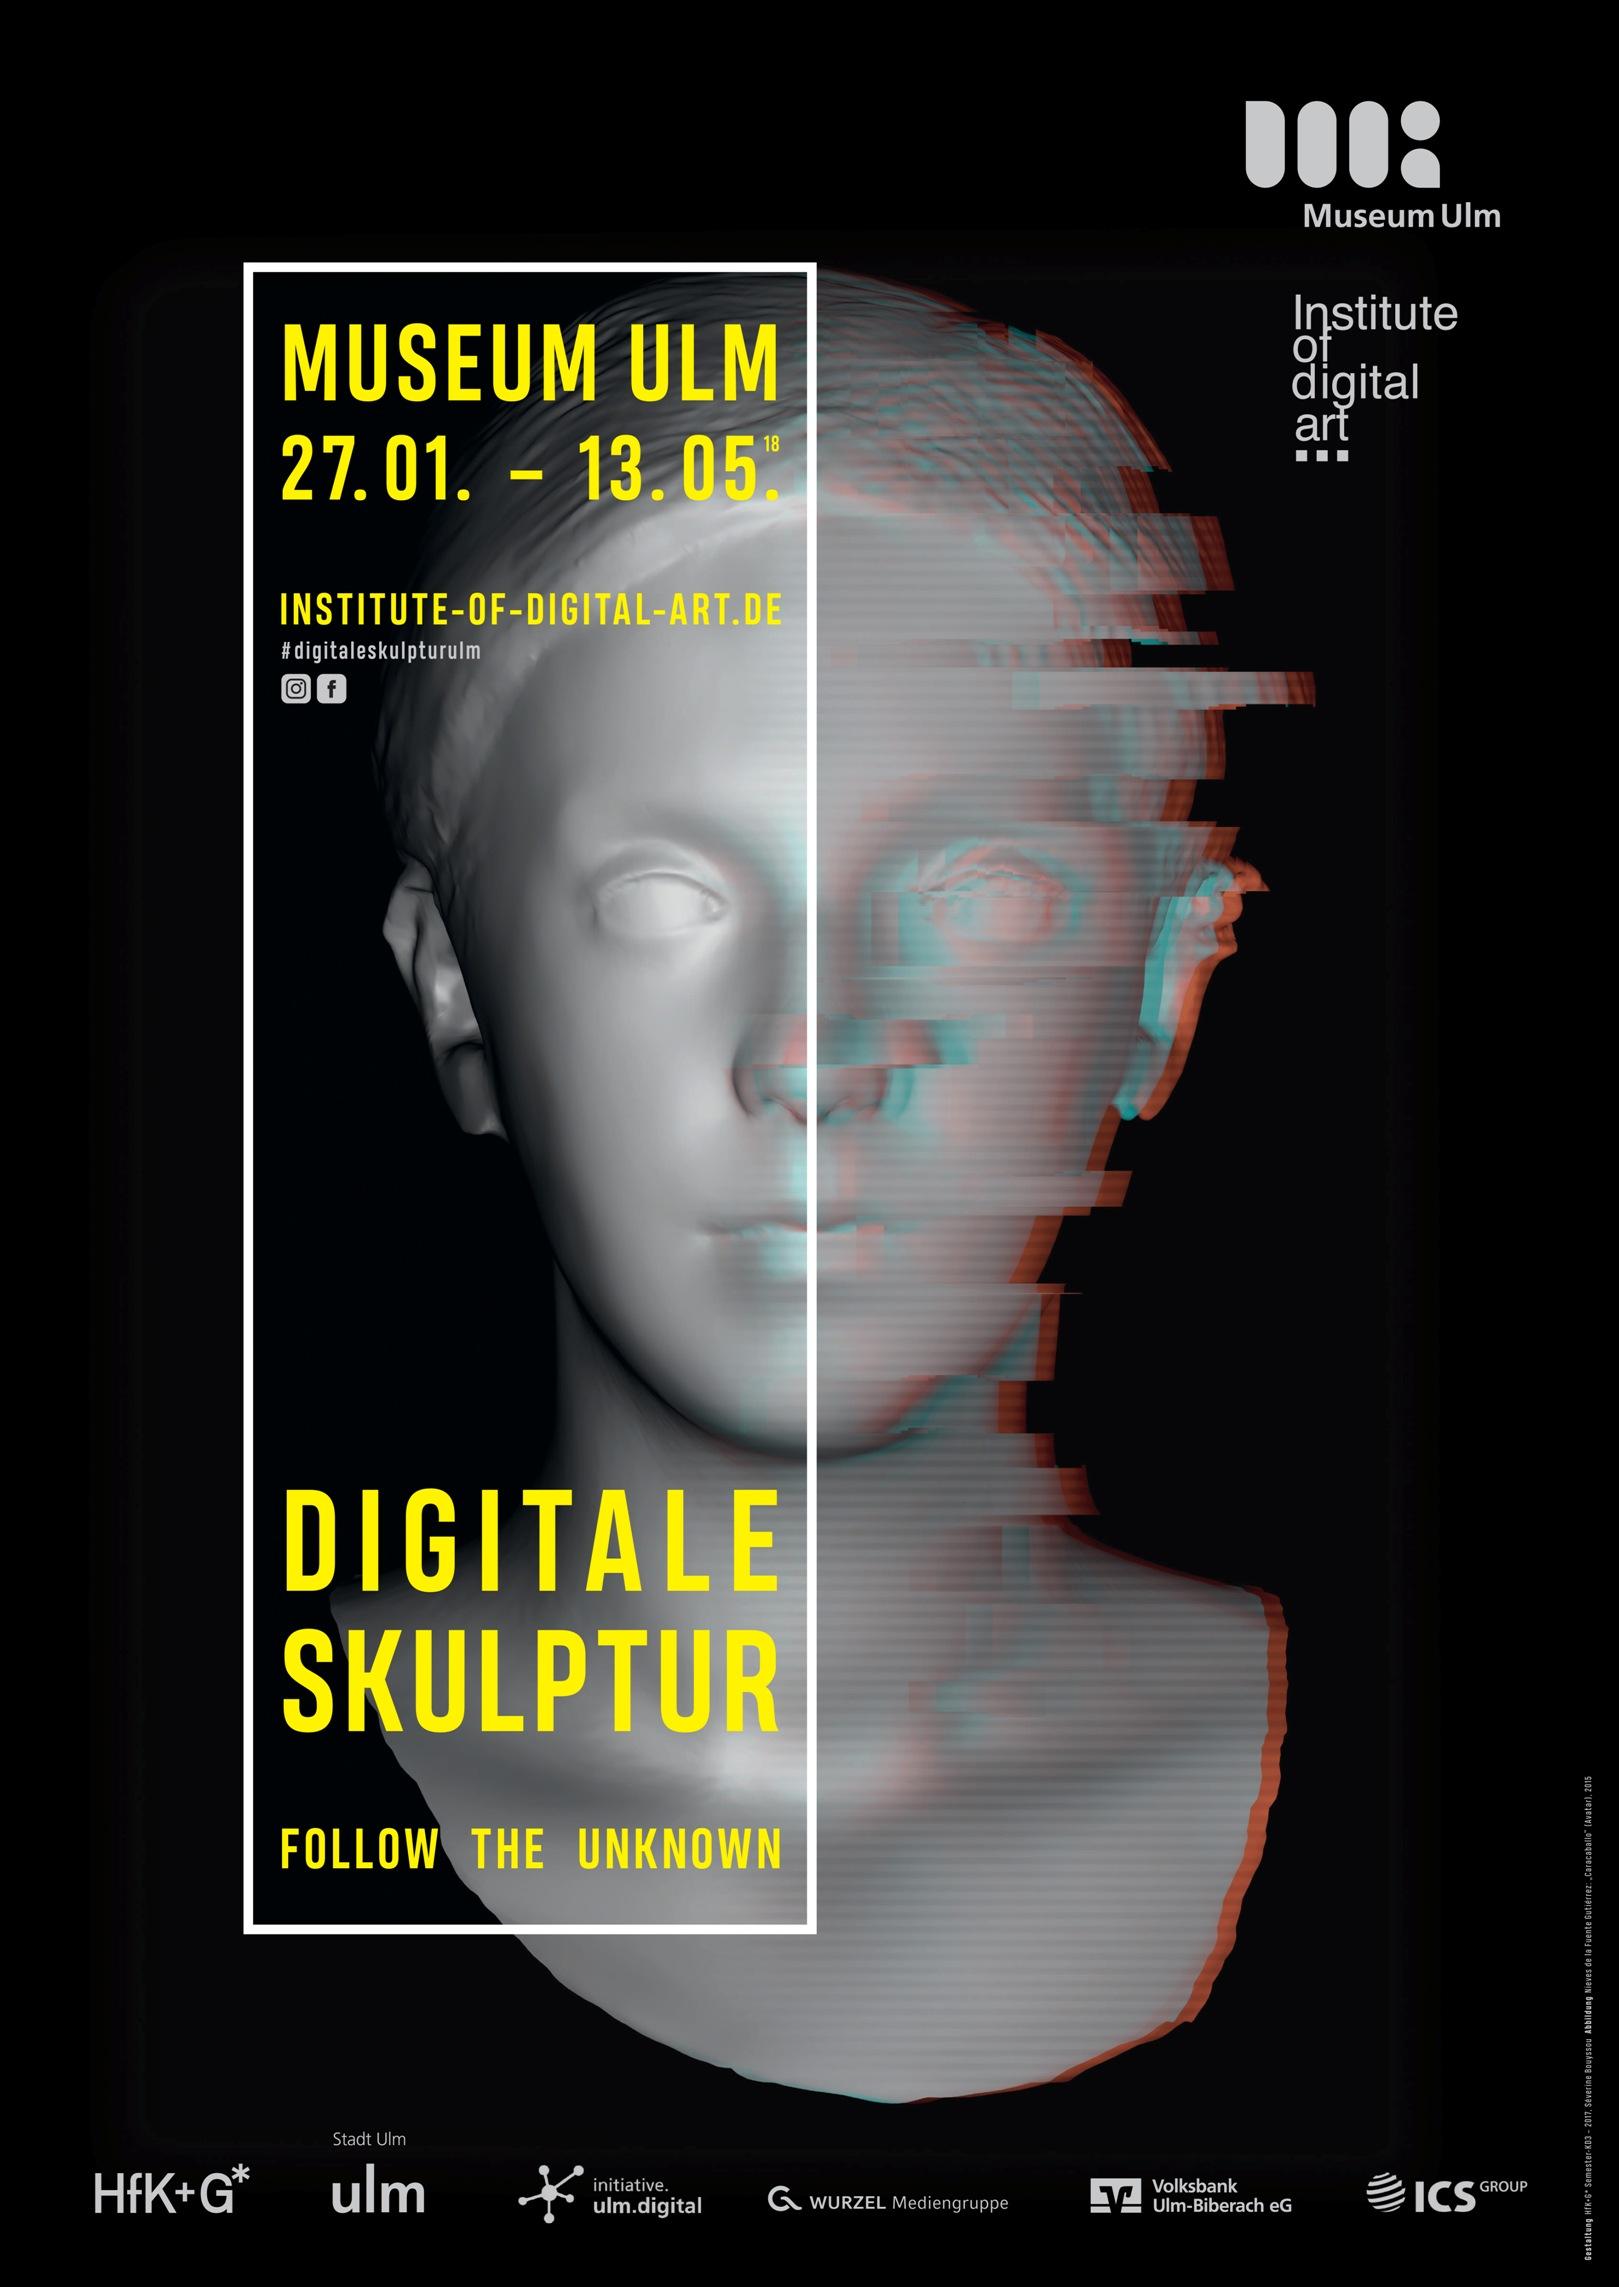 Digitale Skulptur, Museum Ulm, Plakat